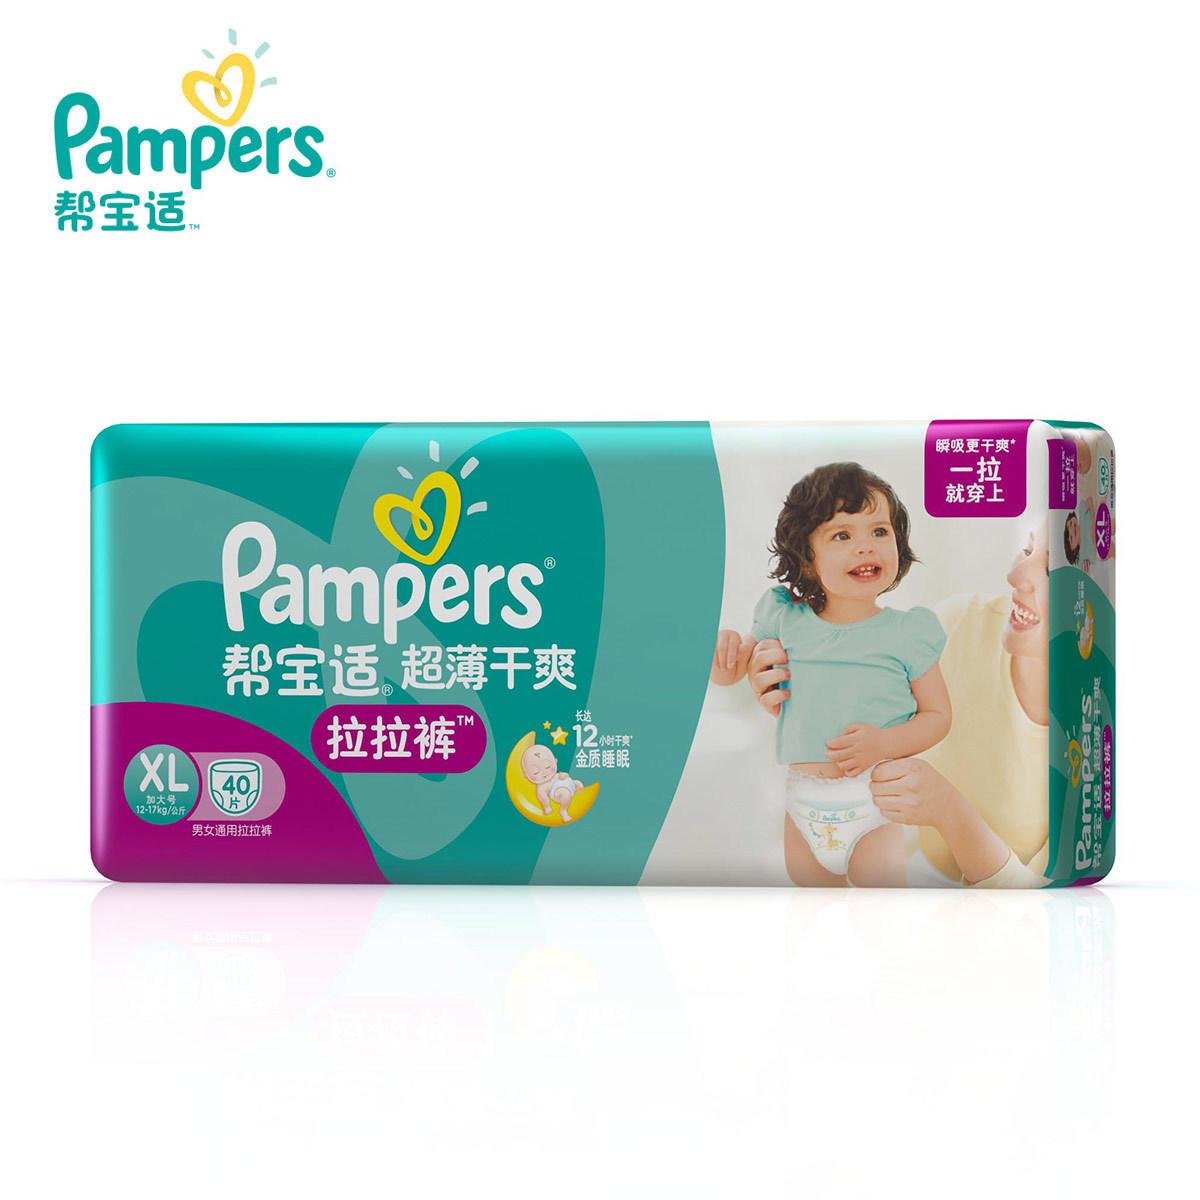 P ers 幫寶適 超薄幹爽 拉拉褲  XL40片